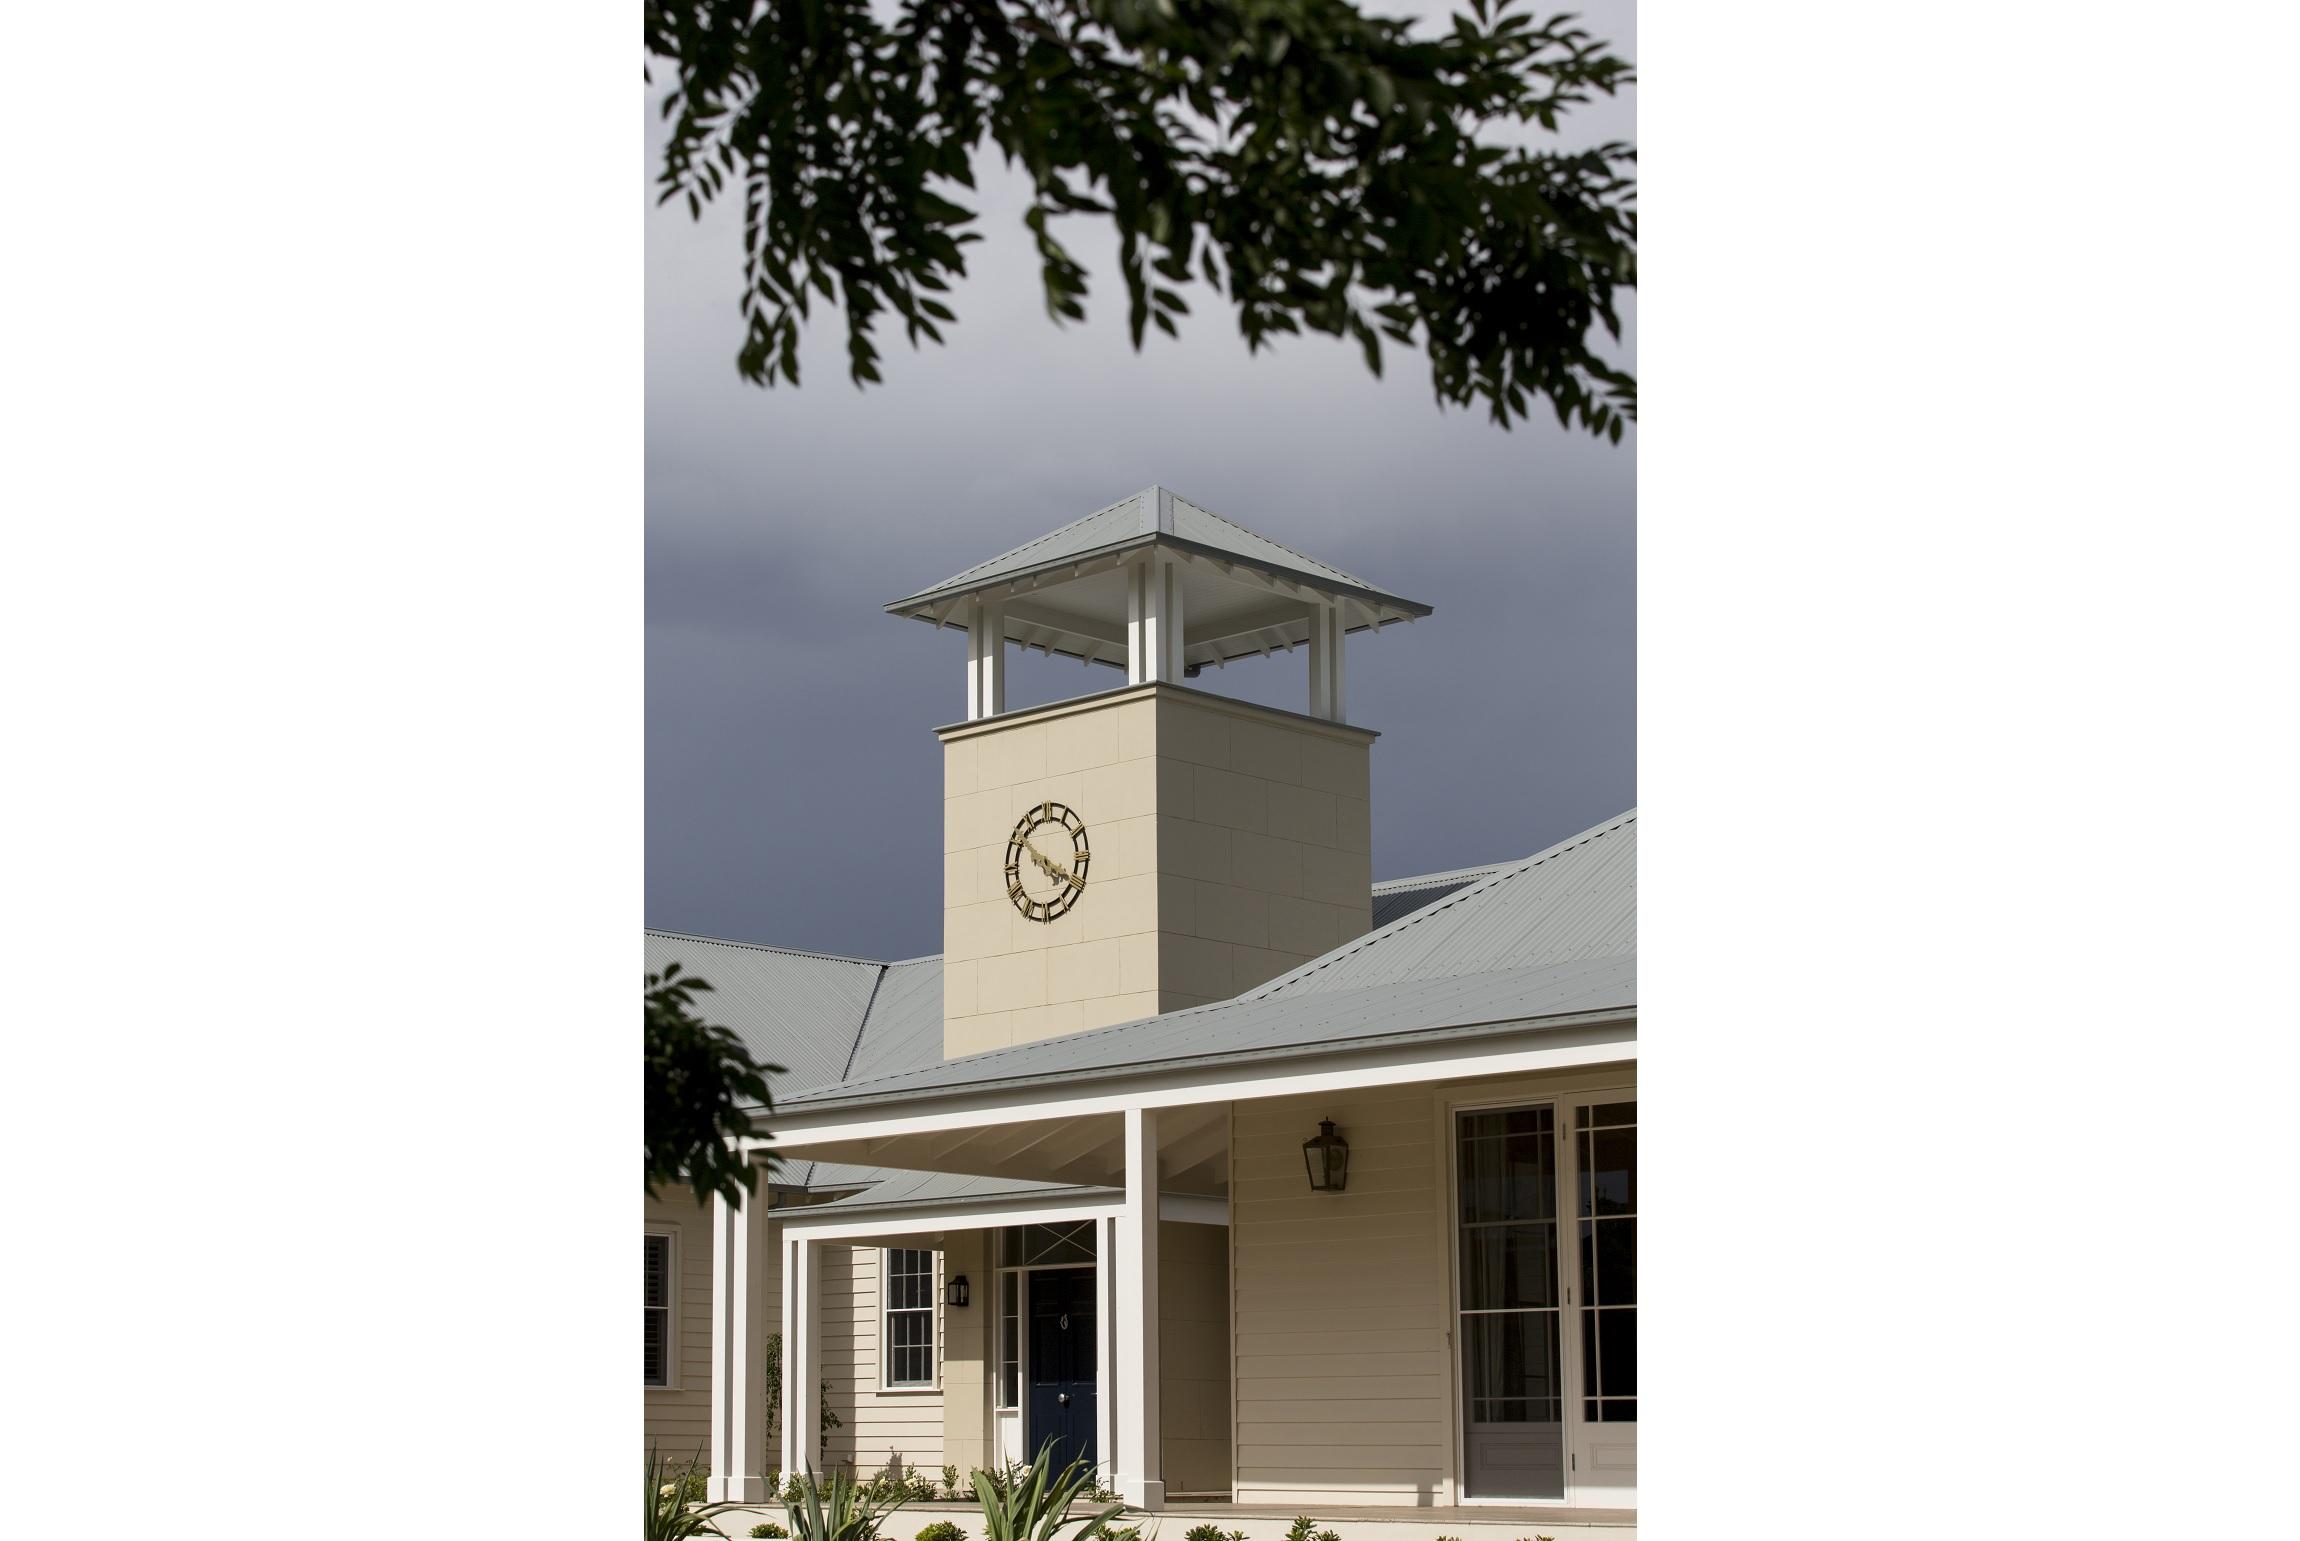 Horse-Stud-Clock-Tower-Hunter-Valley-Michael-Bell-Architects-Sydney